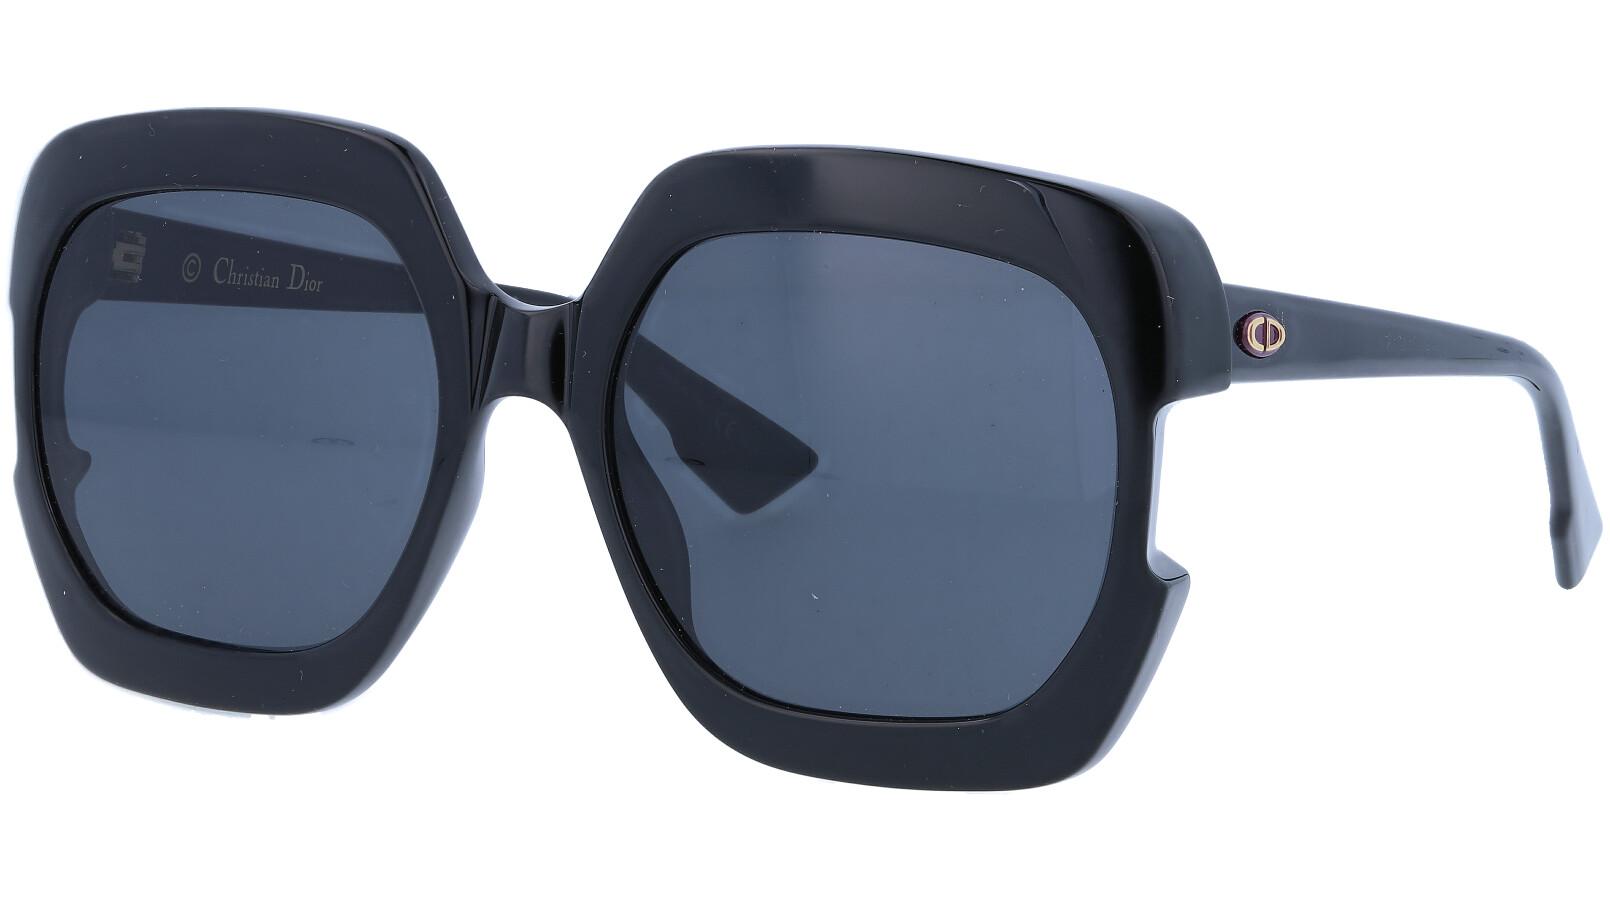 Dior GAIA PJP 58 Blue Sunglasses